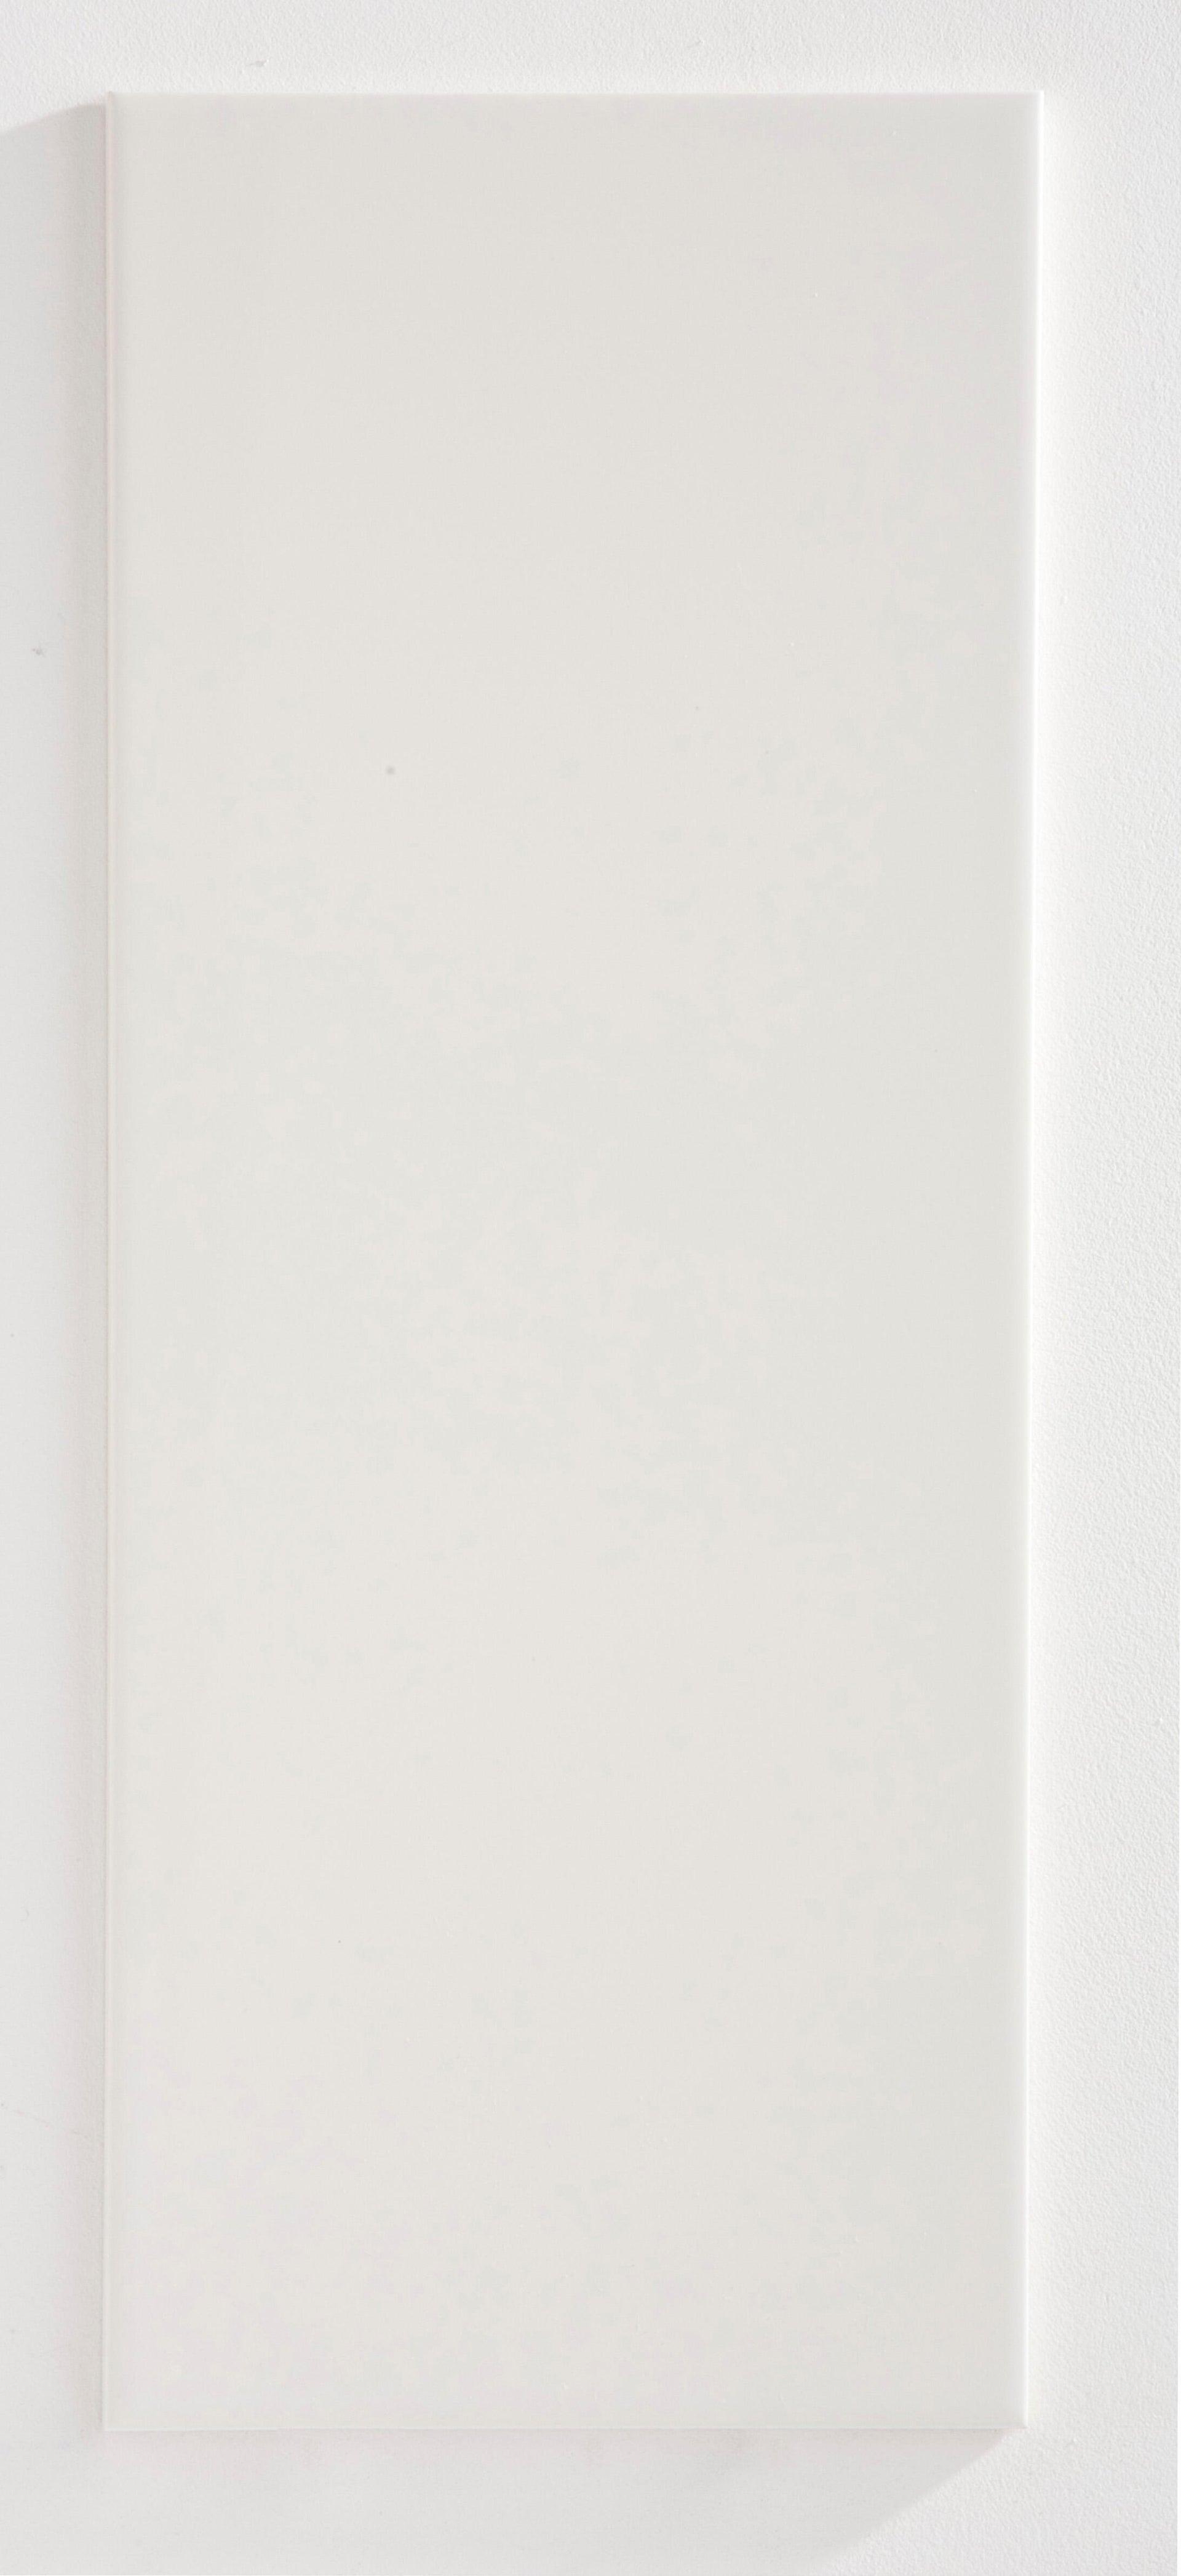 Piastrella per rivestimenti Loft 20 x 50.2 cm sp. 9 mm bianco - 7